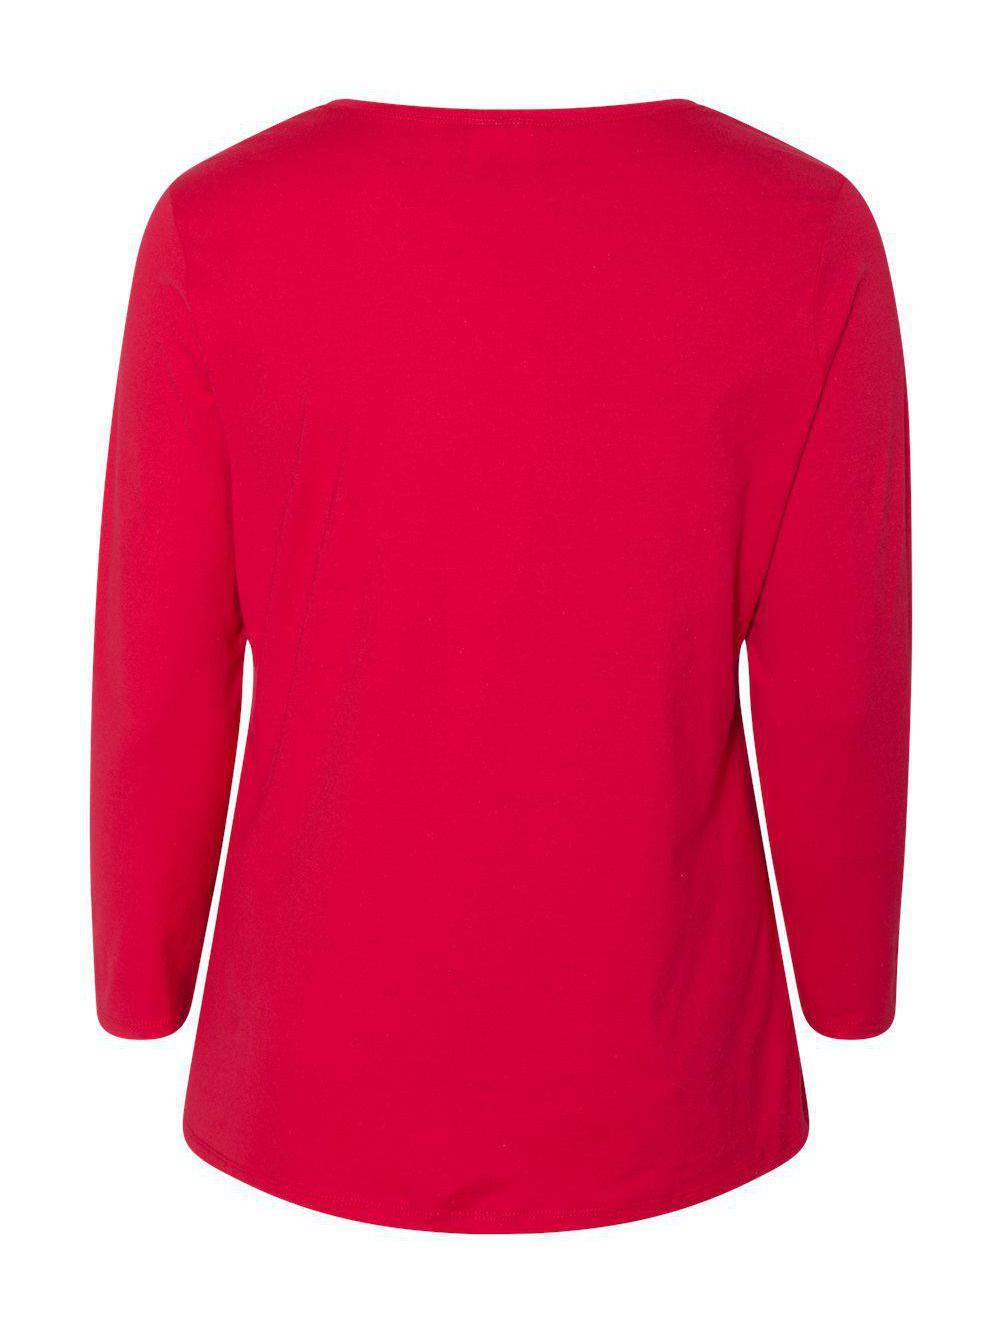 Just-My-Size-Women-039-s-Long-Sleeve-T-Shirt-JMS40 thumbnail 10